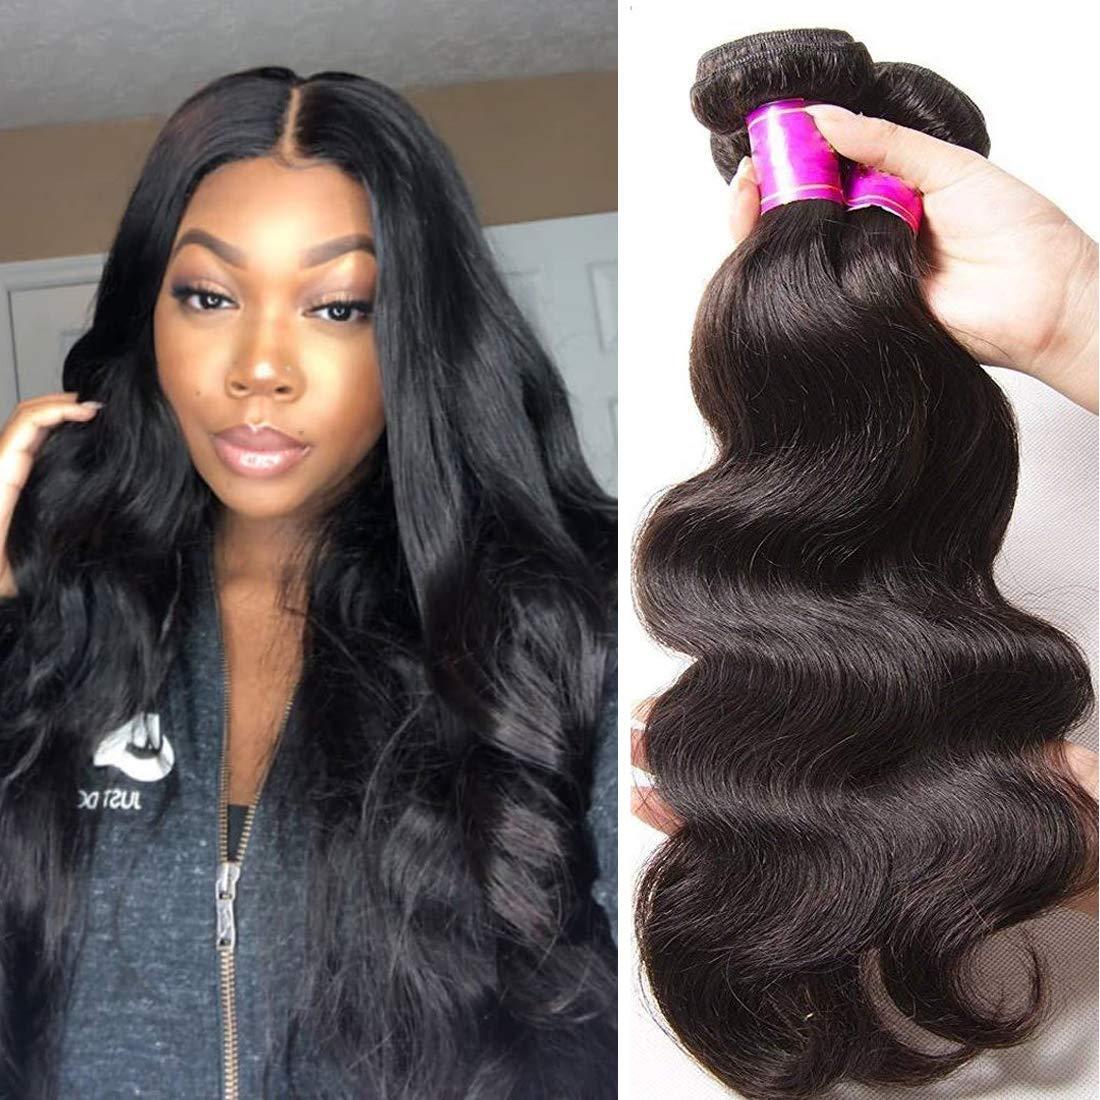 Ali Julia Hair 14 16 18 Inch Brazilian 10a Virgin Body Wave Hair Weave 3 Bundles100 Unprocessed Human Hair Weft Extensions Natural Color 95 100g Pc